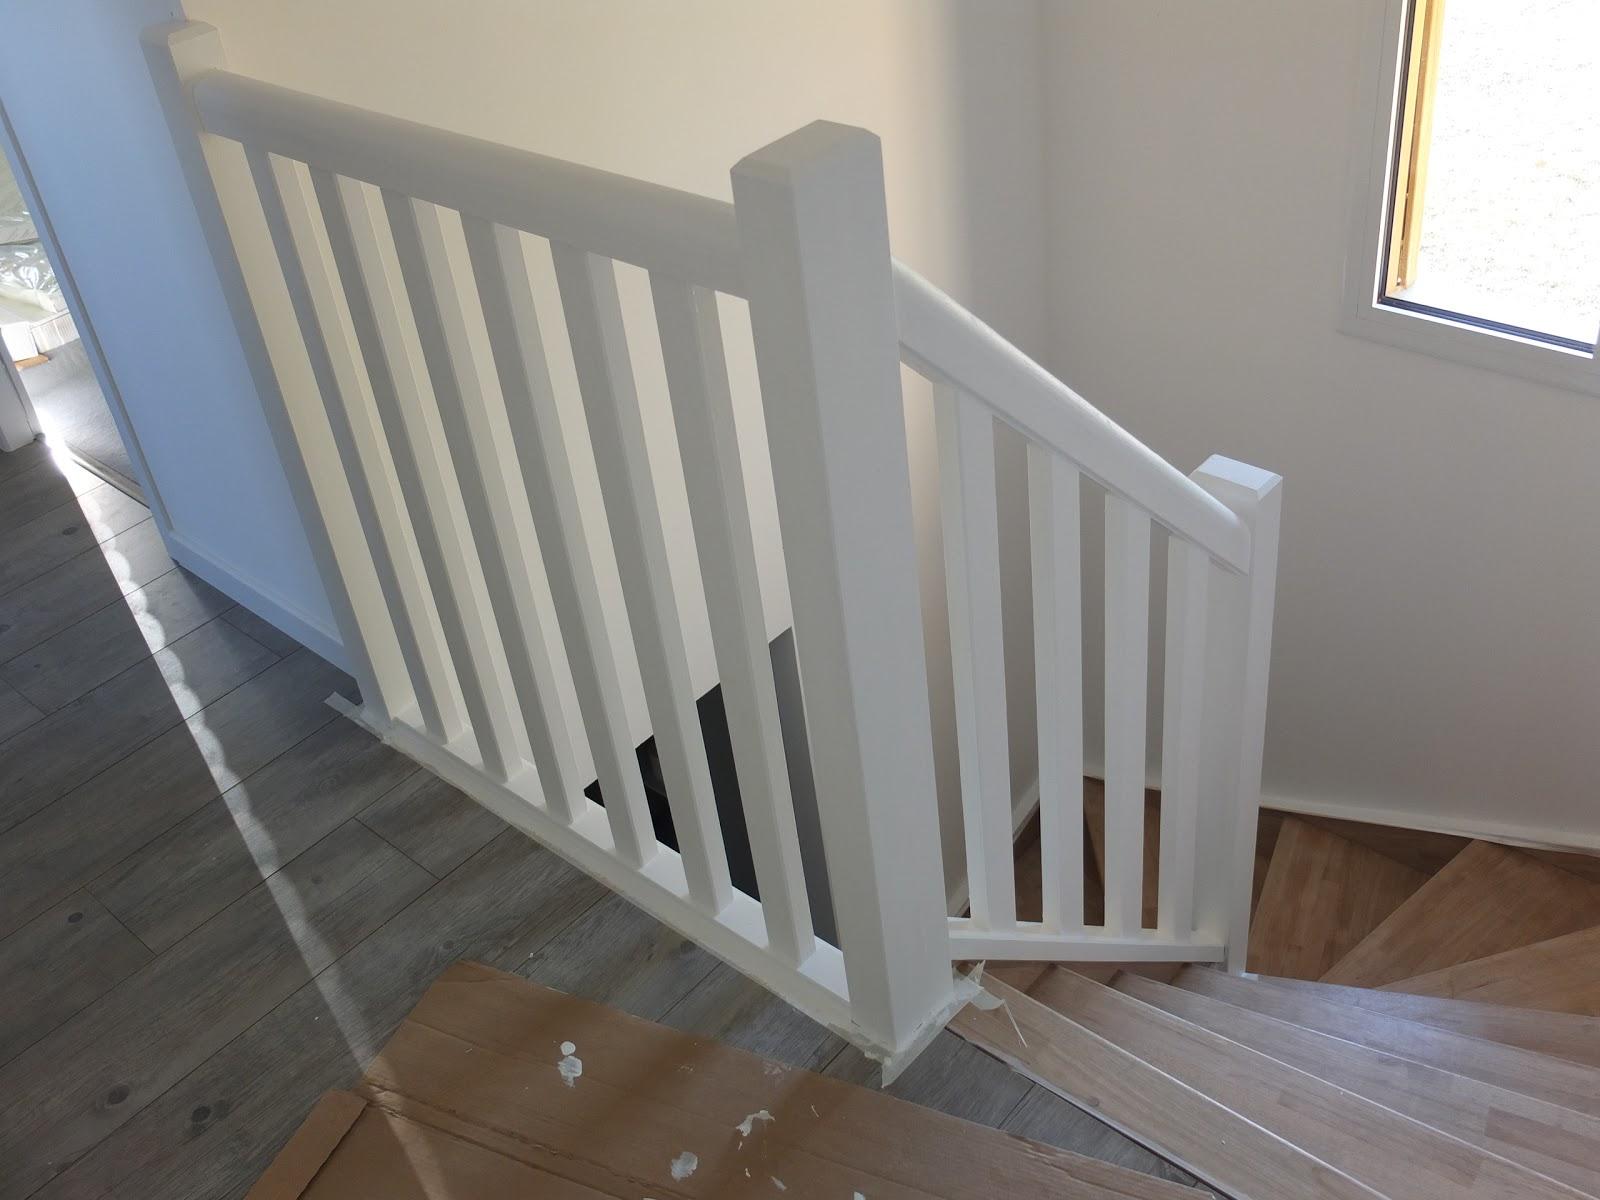 Peinture escalier bois interieur photos de conception de for Peinture escalier bois interieur